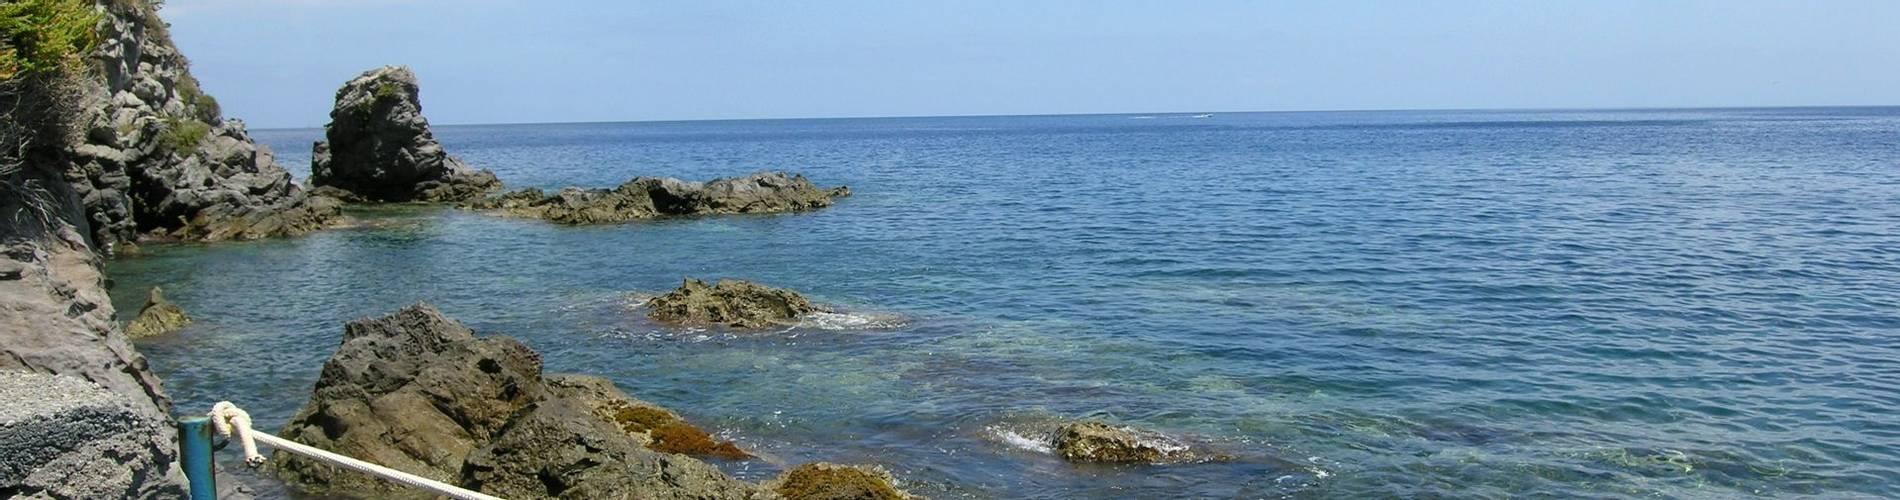 Rocce Azzurre, Sicily, Italy (10).JPG